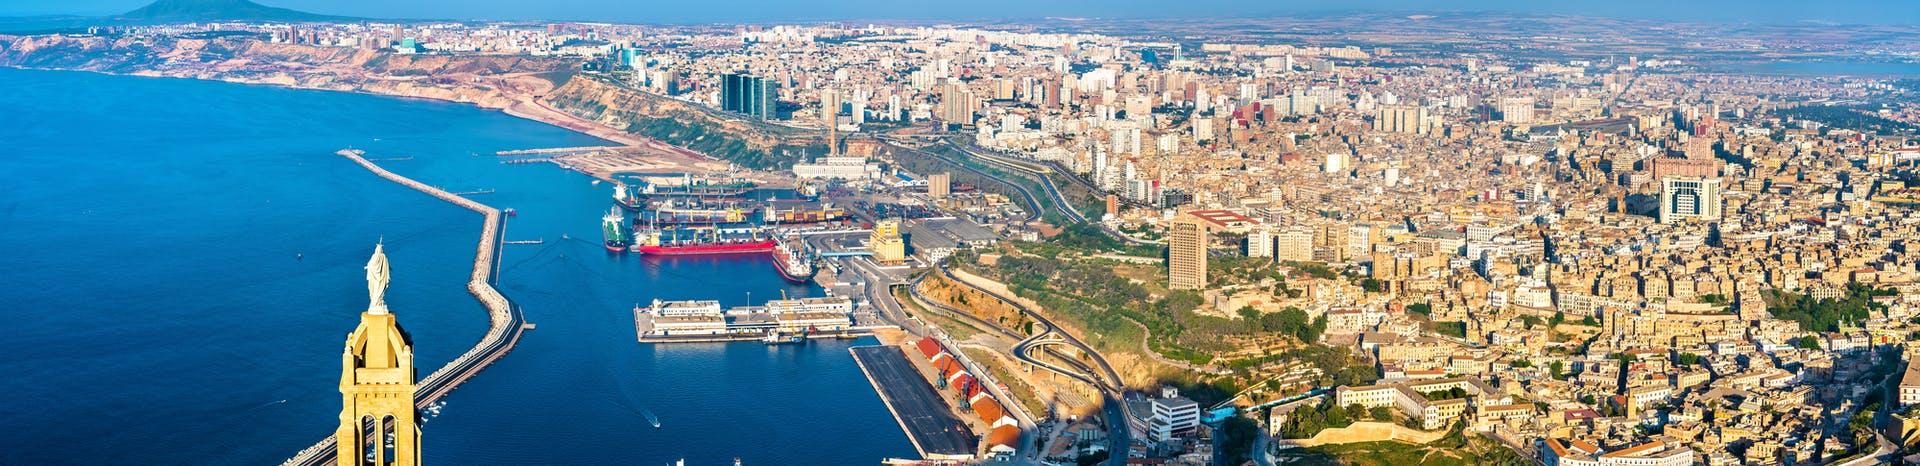 Picture of Oran